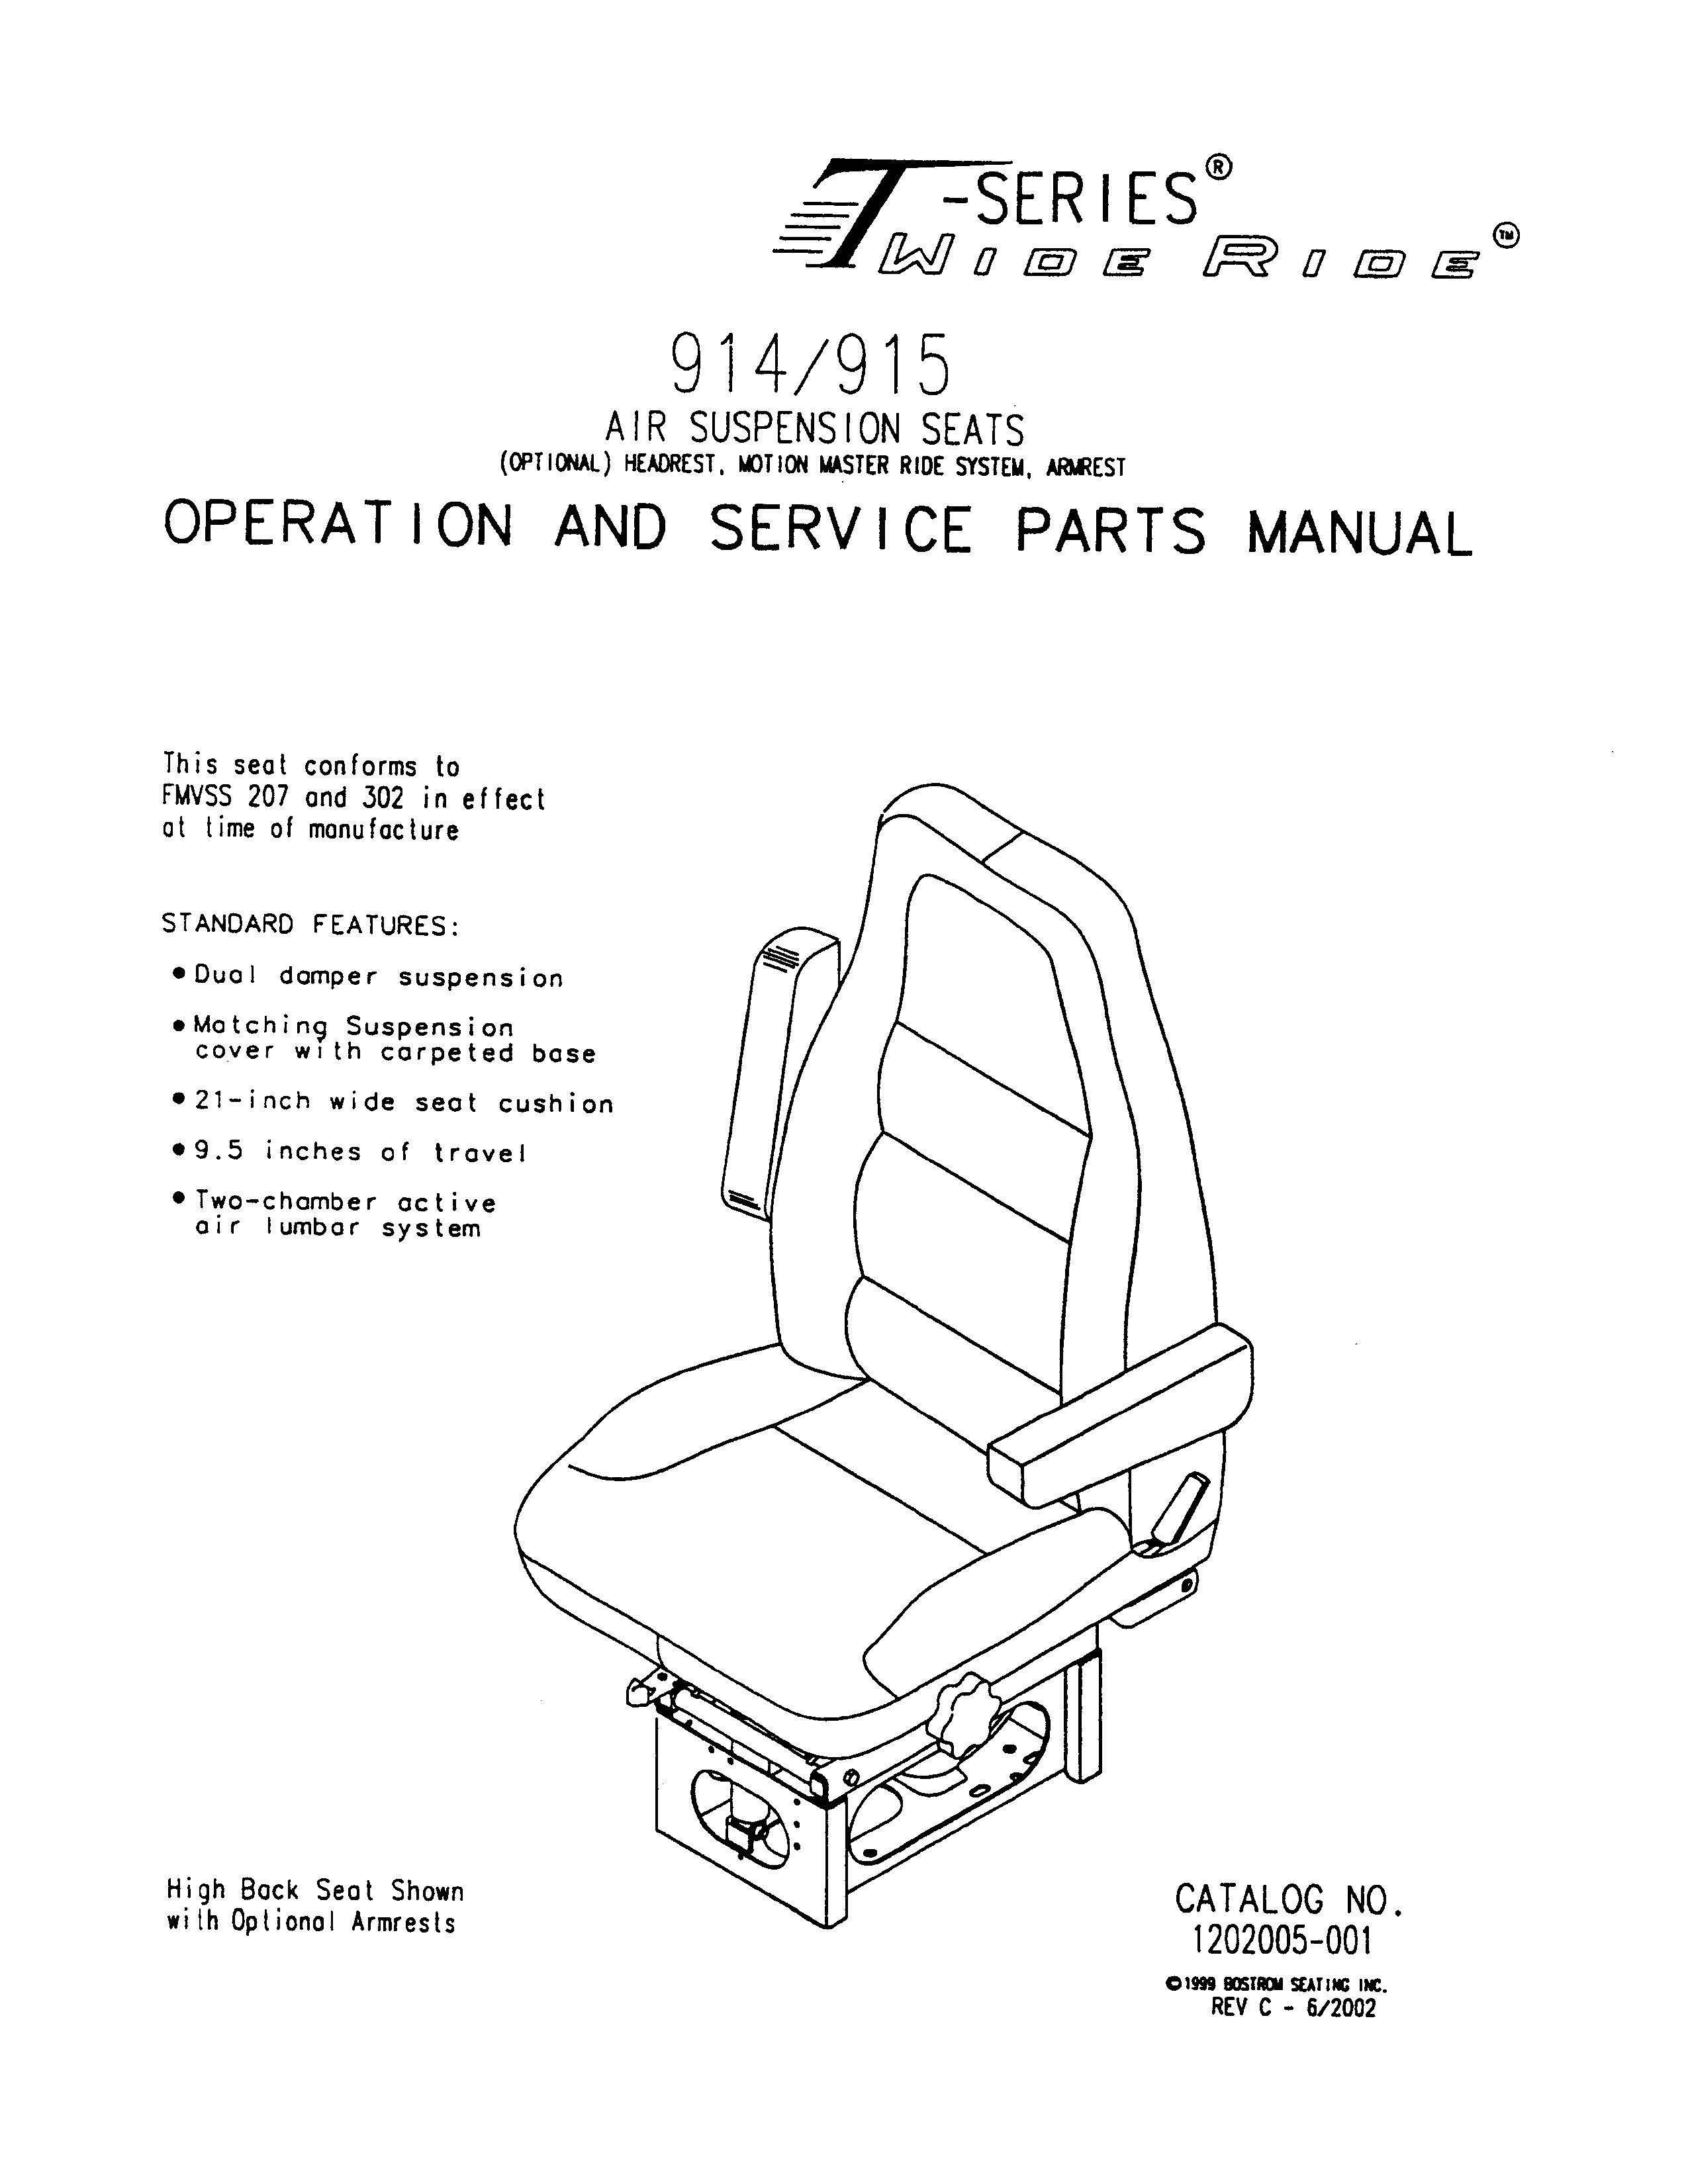 Bostrom Seating | M S  Foster & Associates, Inc